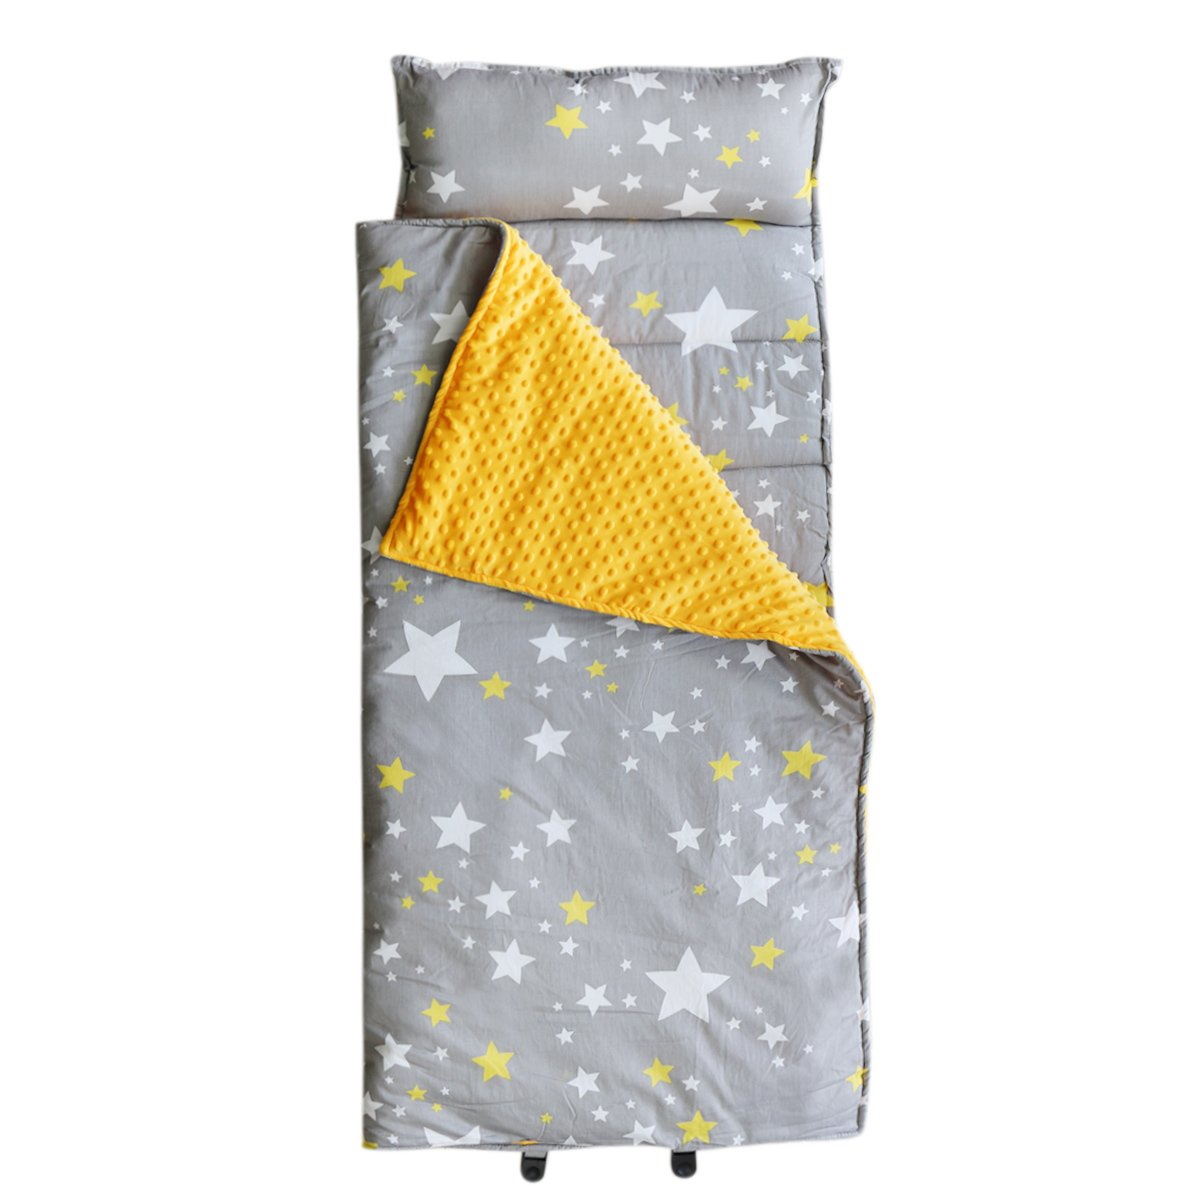 Hi Sprout Kids Toddler Lightweight and Soft Nap Mat- Minky Dot& Cotton-Stars